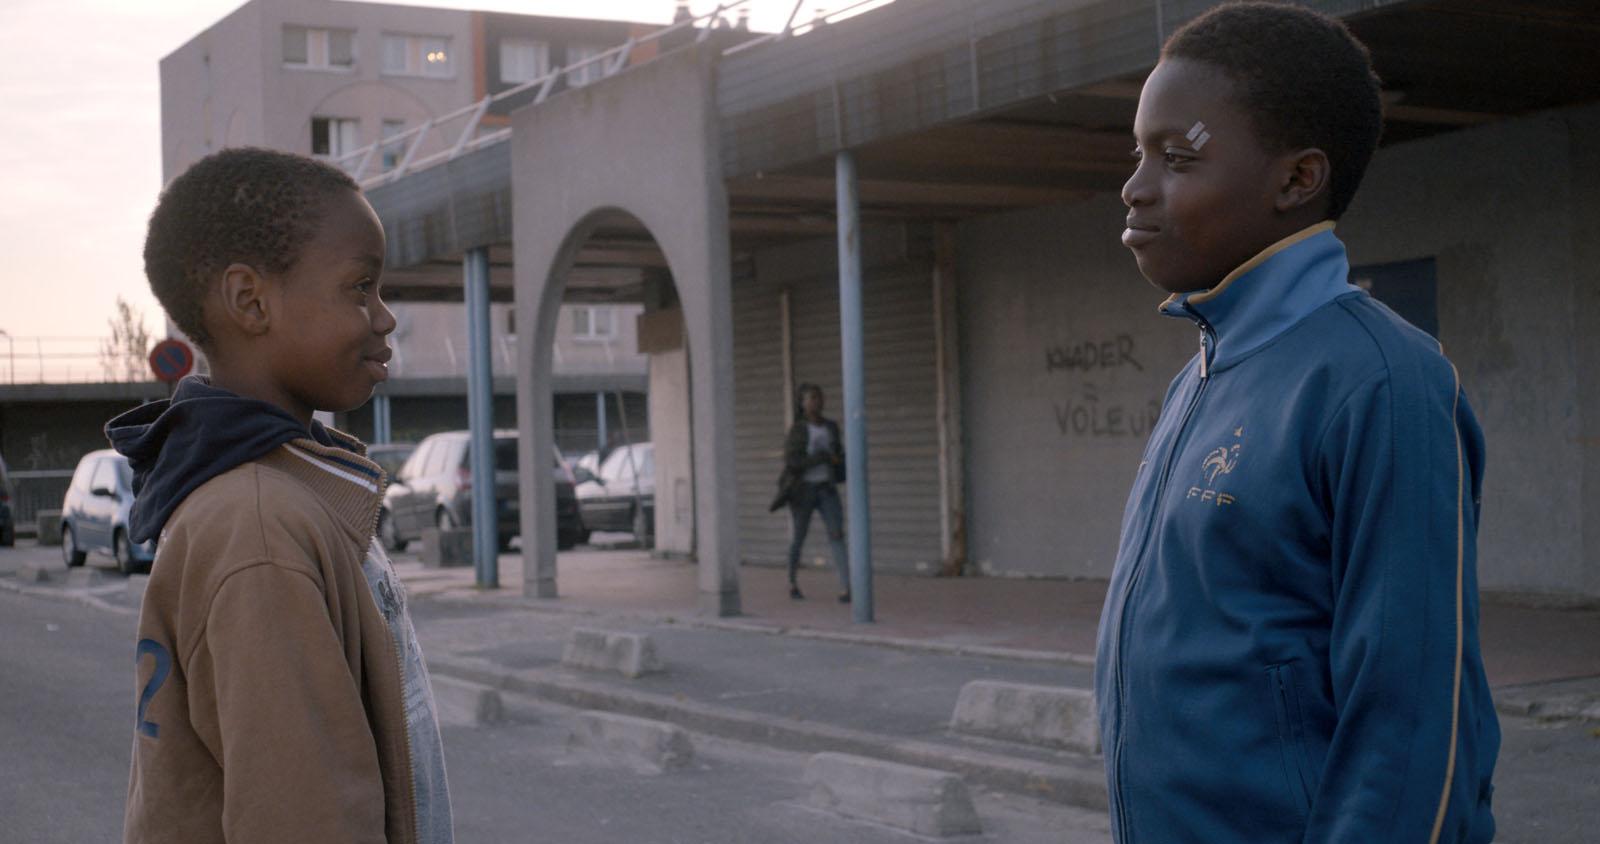 Ali Bidanessy et Balamine Guirassy, interprêtes du film La Vie en grand. © Gaumont Distribution